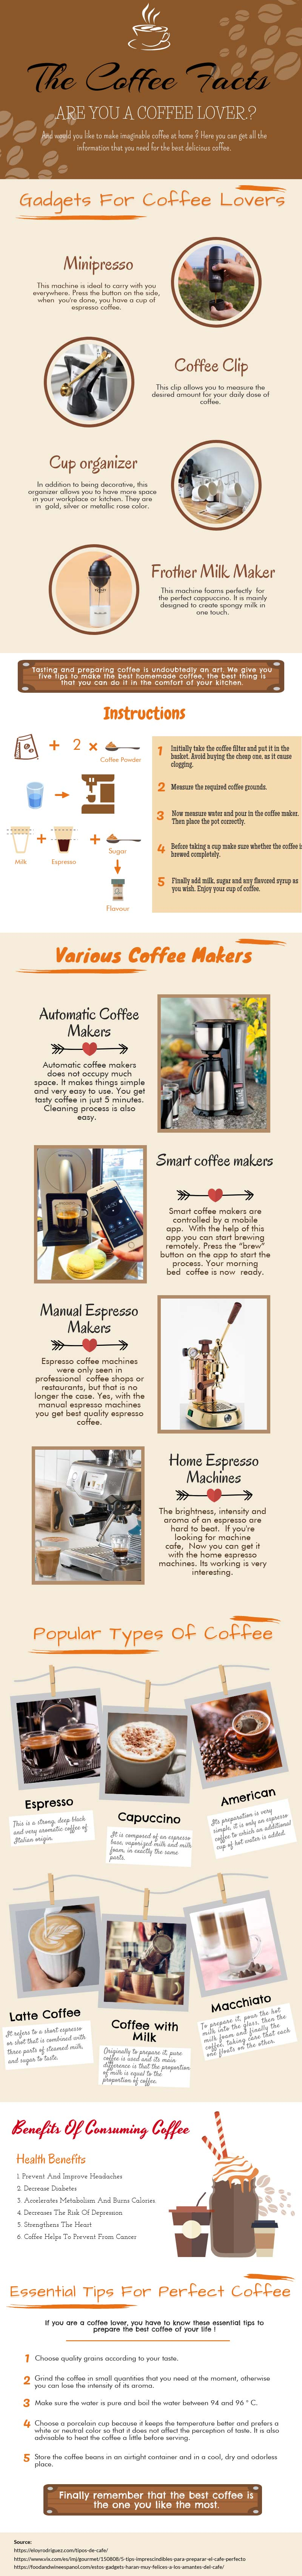 coffeelifious